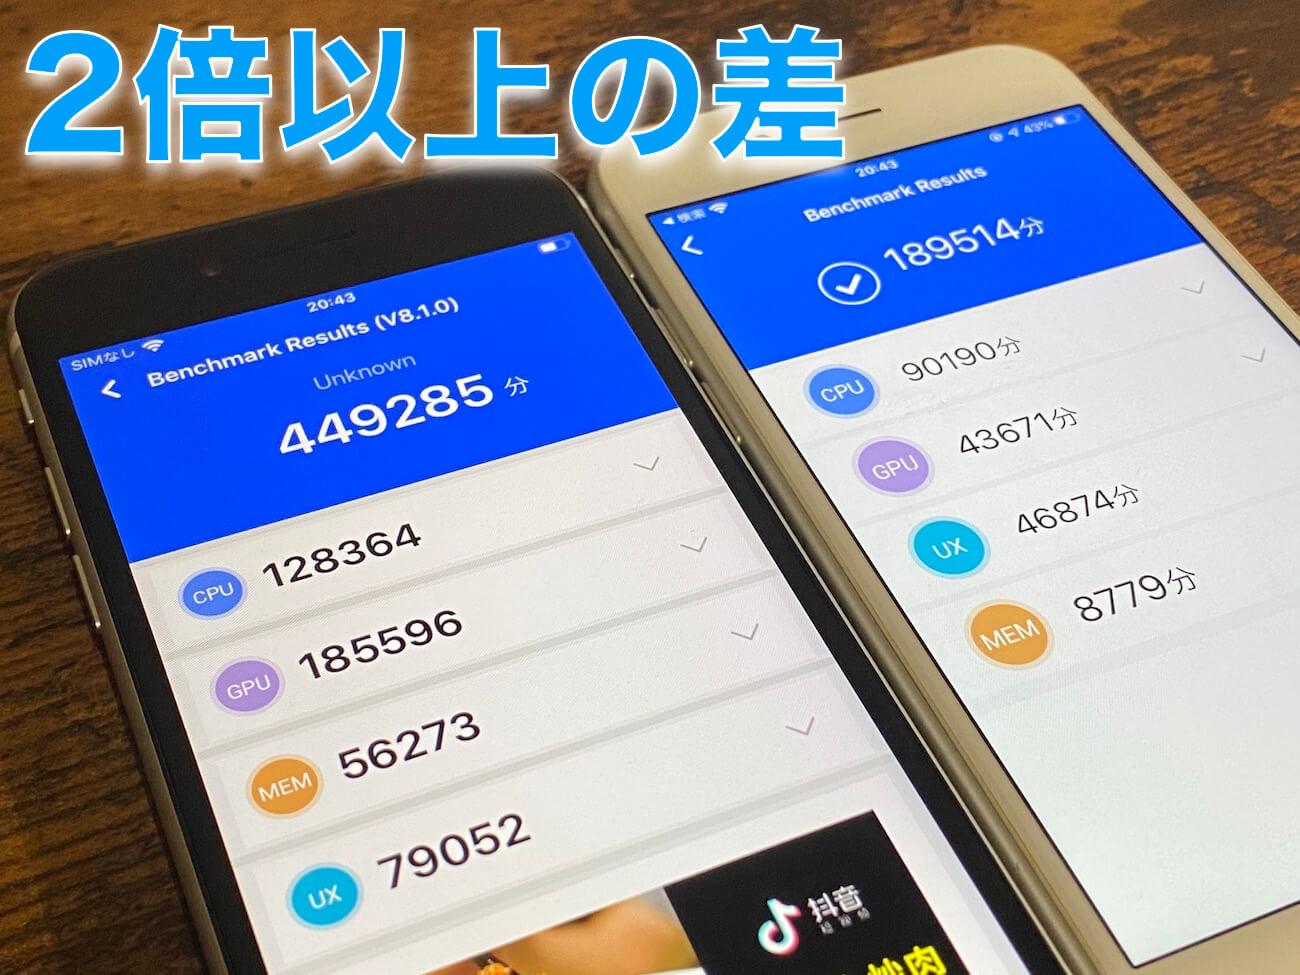 iPhone SE(第2世代) iPhone8 antutuベンチマーク